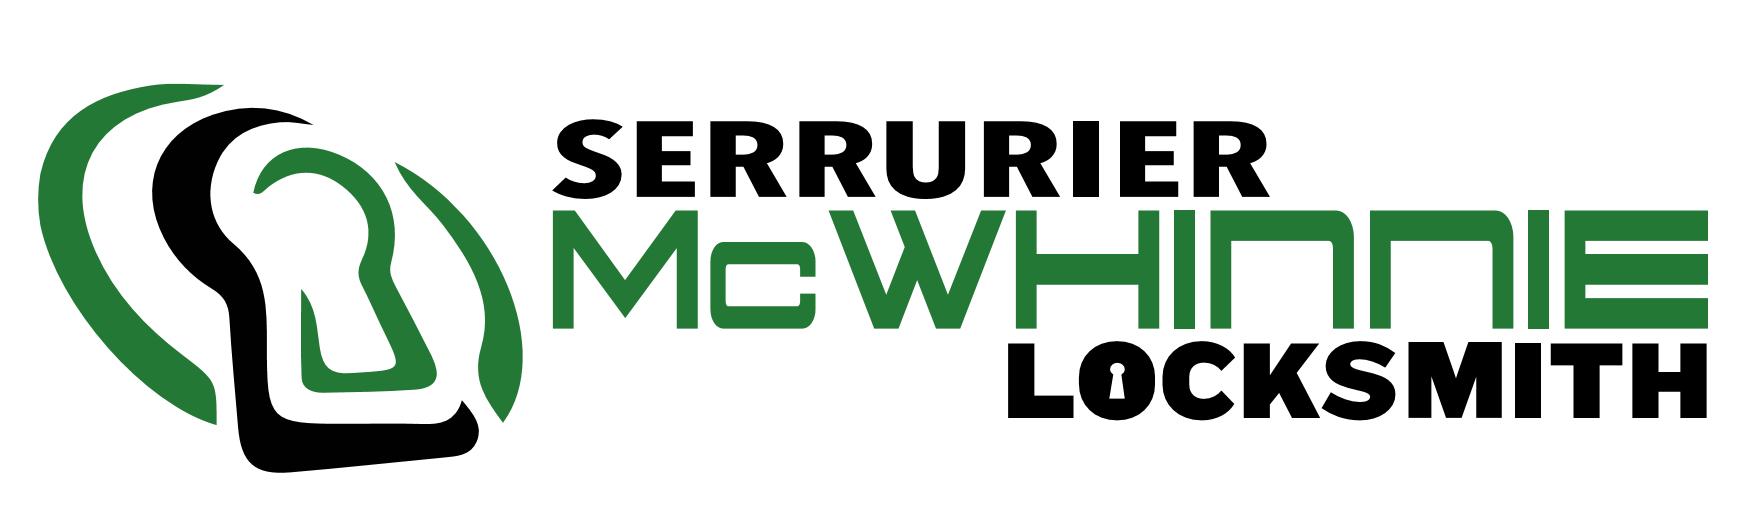 Serrurier McWhinnie Locksmith Inc Montreal (514)952-8891